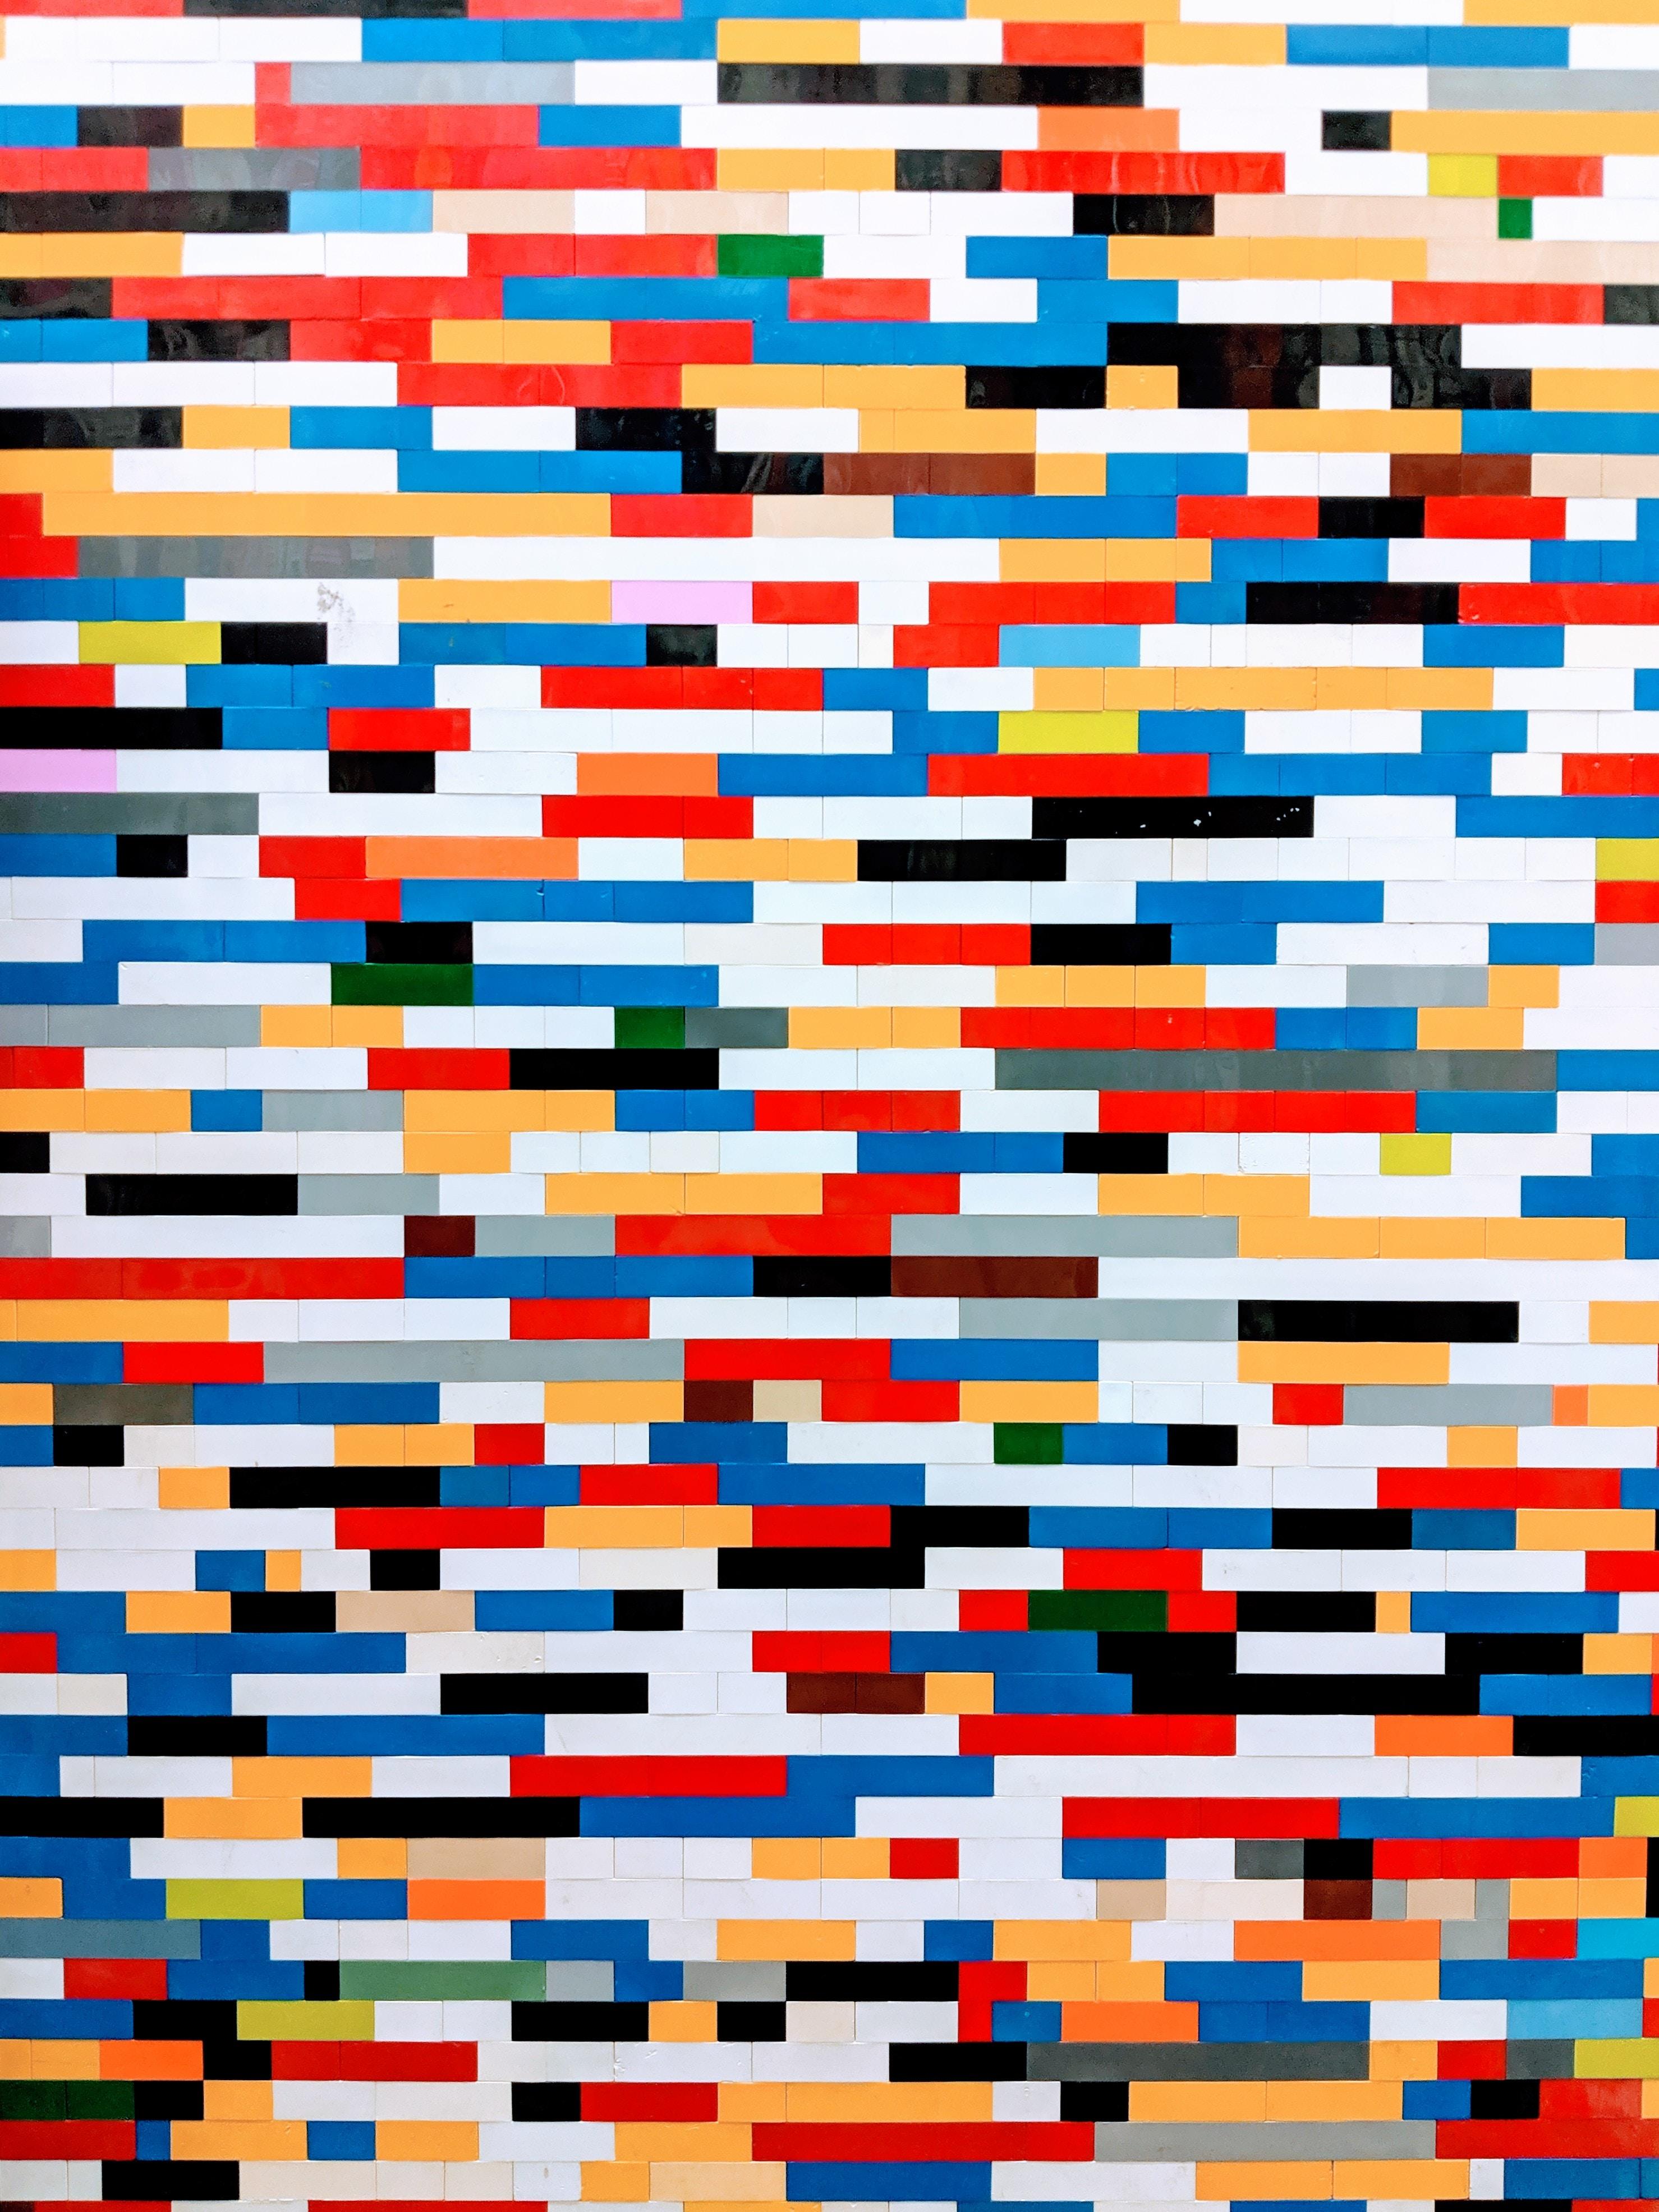 LEGO (Lido Ecosystem Grants Organisation)